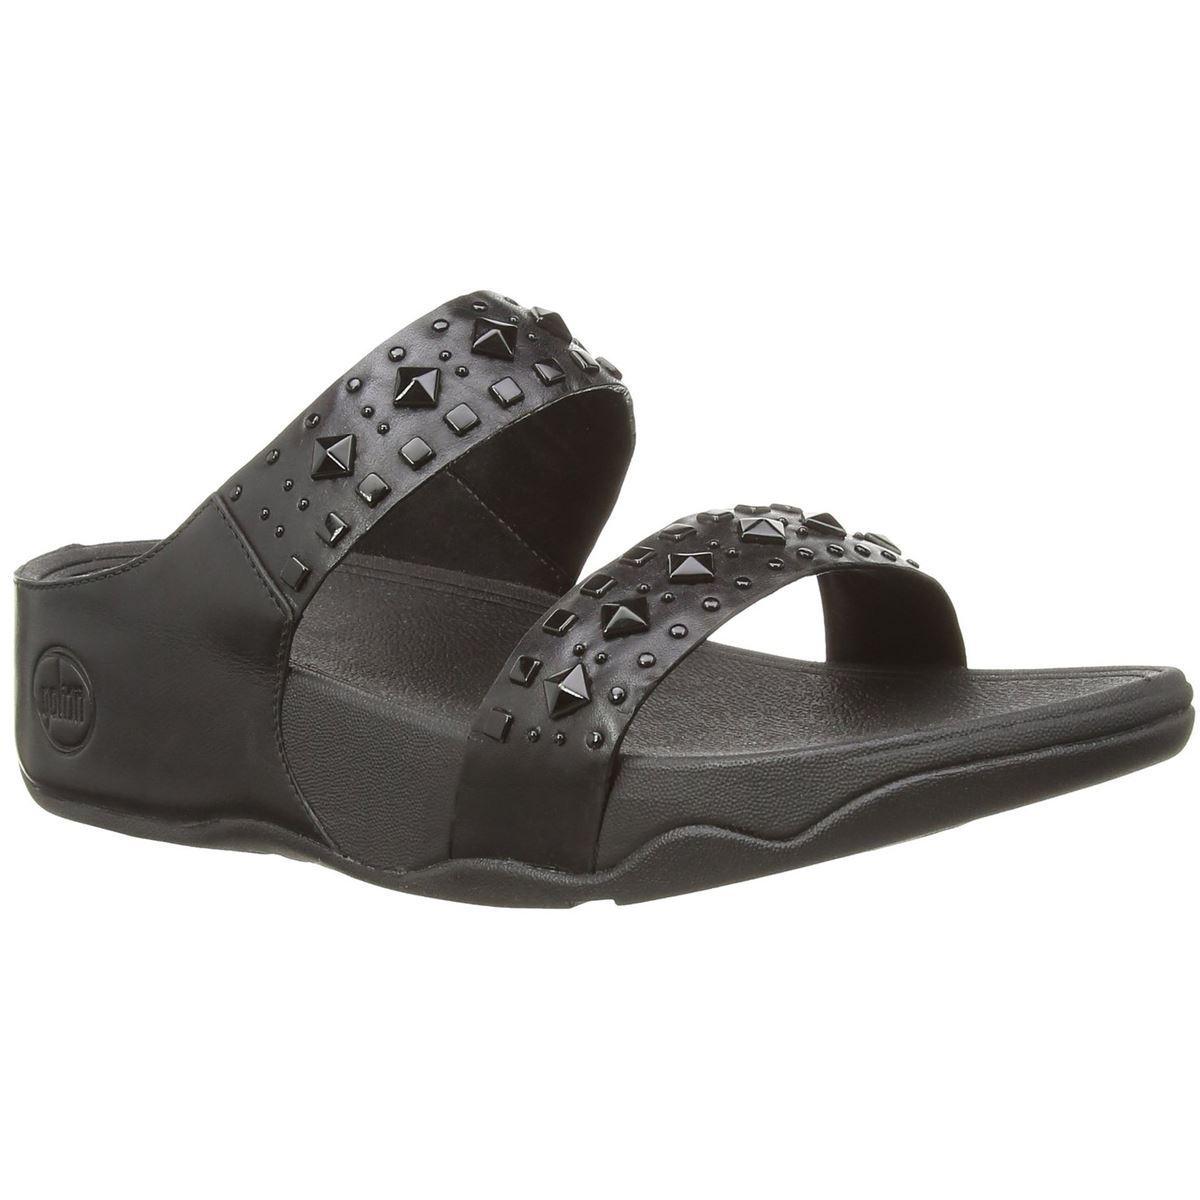 Womens sandals ebay - Image Is Loading Fitflop Biker Chic Slide Black Womens Sandals